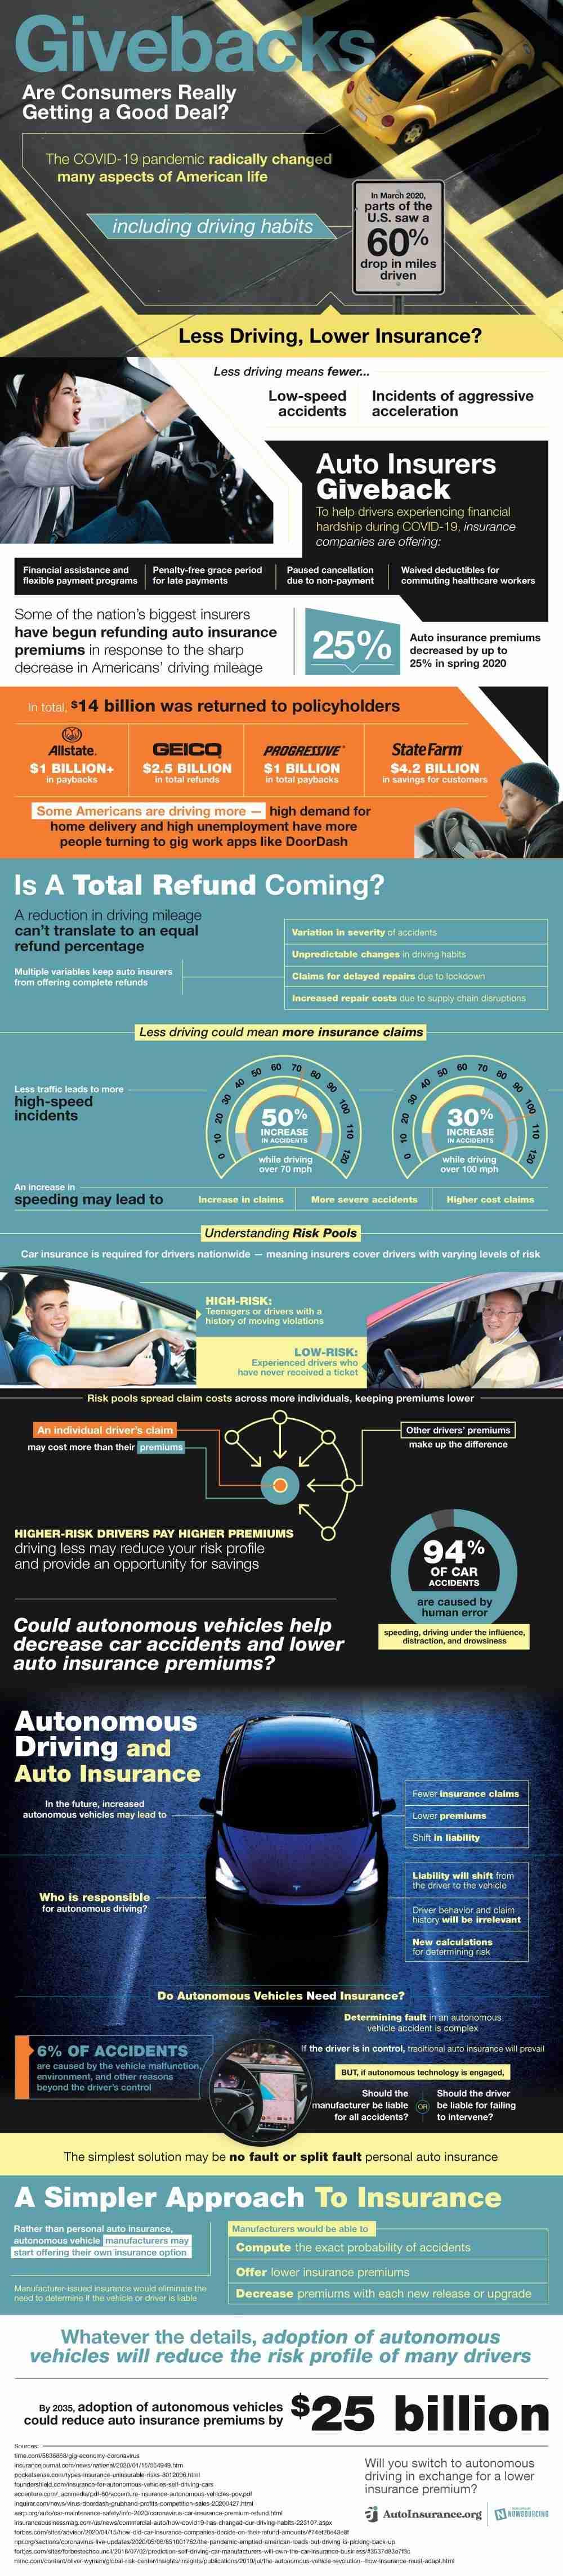 Impact of Autonomous Driving on Auto Insurance Pricing